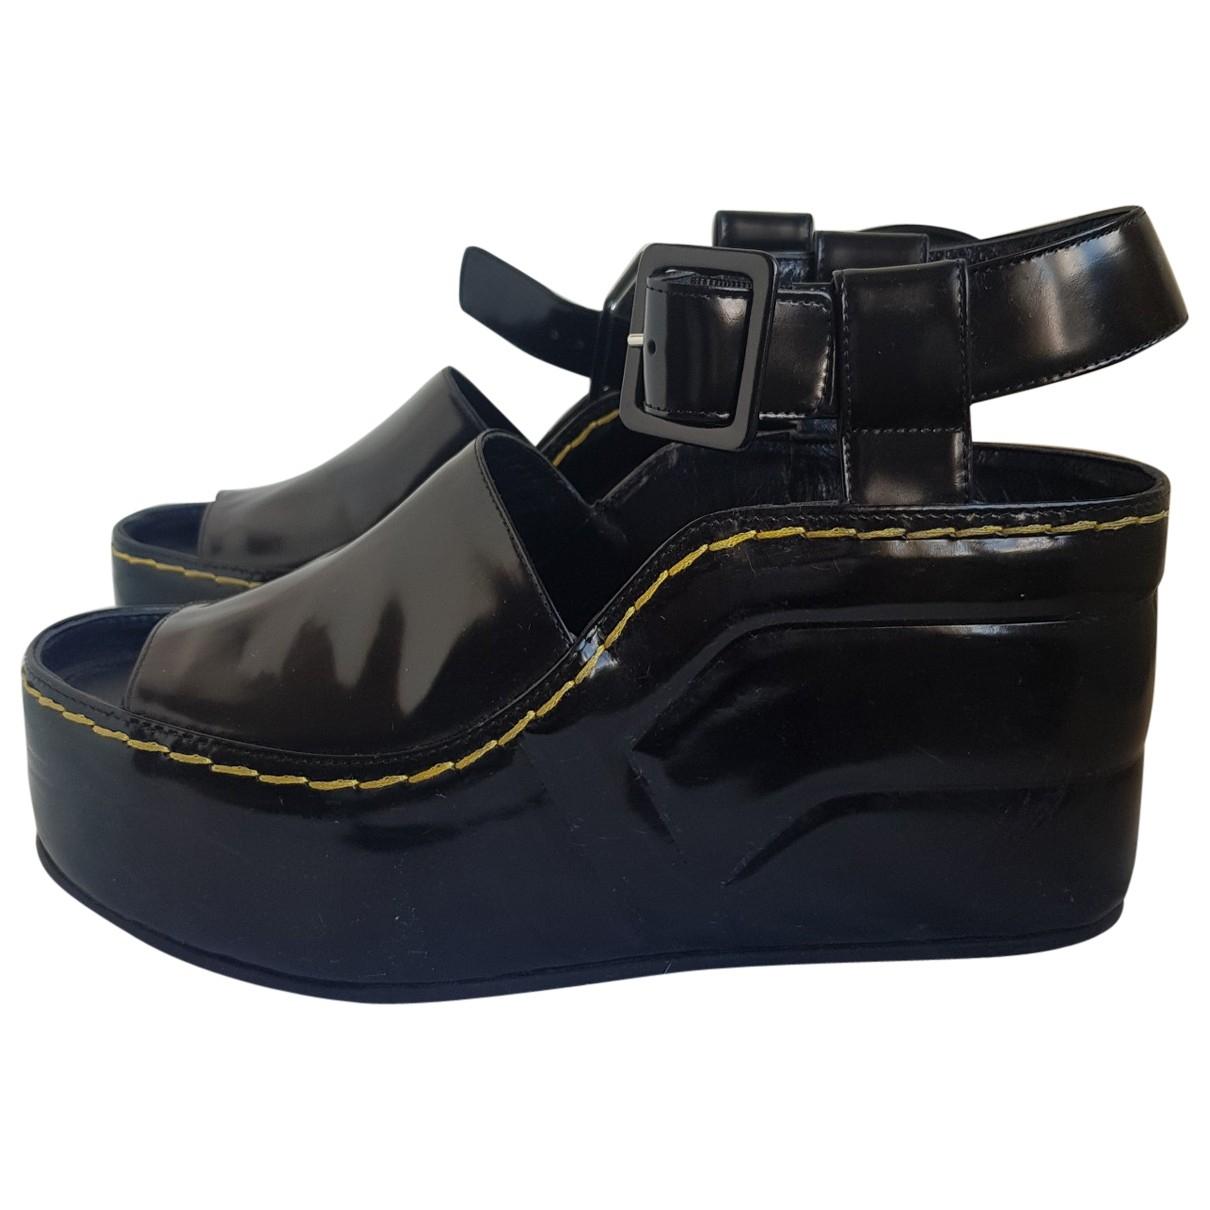 Celine \N Black Patent leather Sandals for Women 40 IT